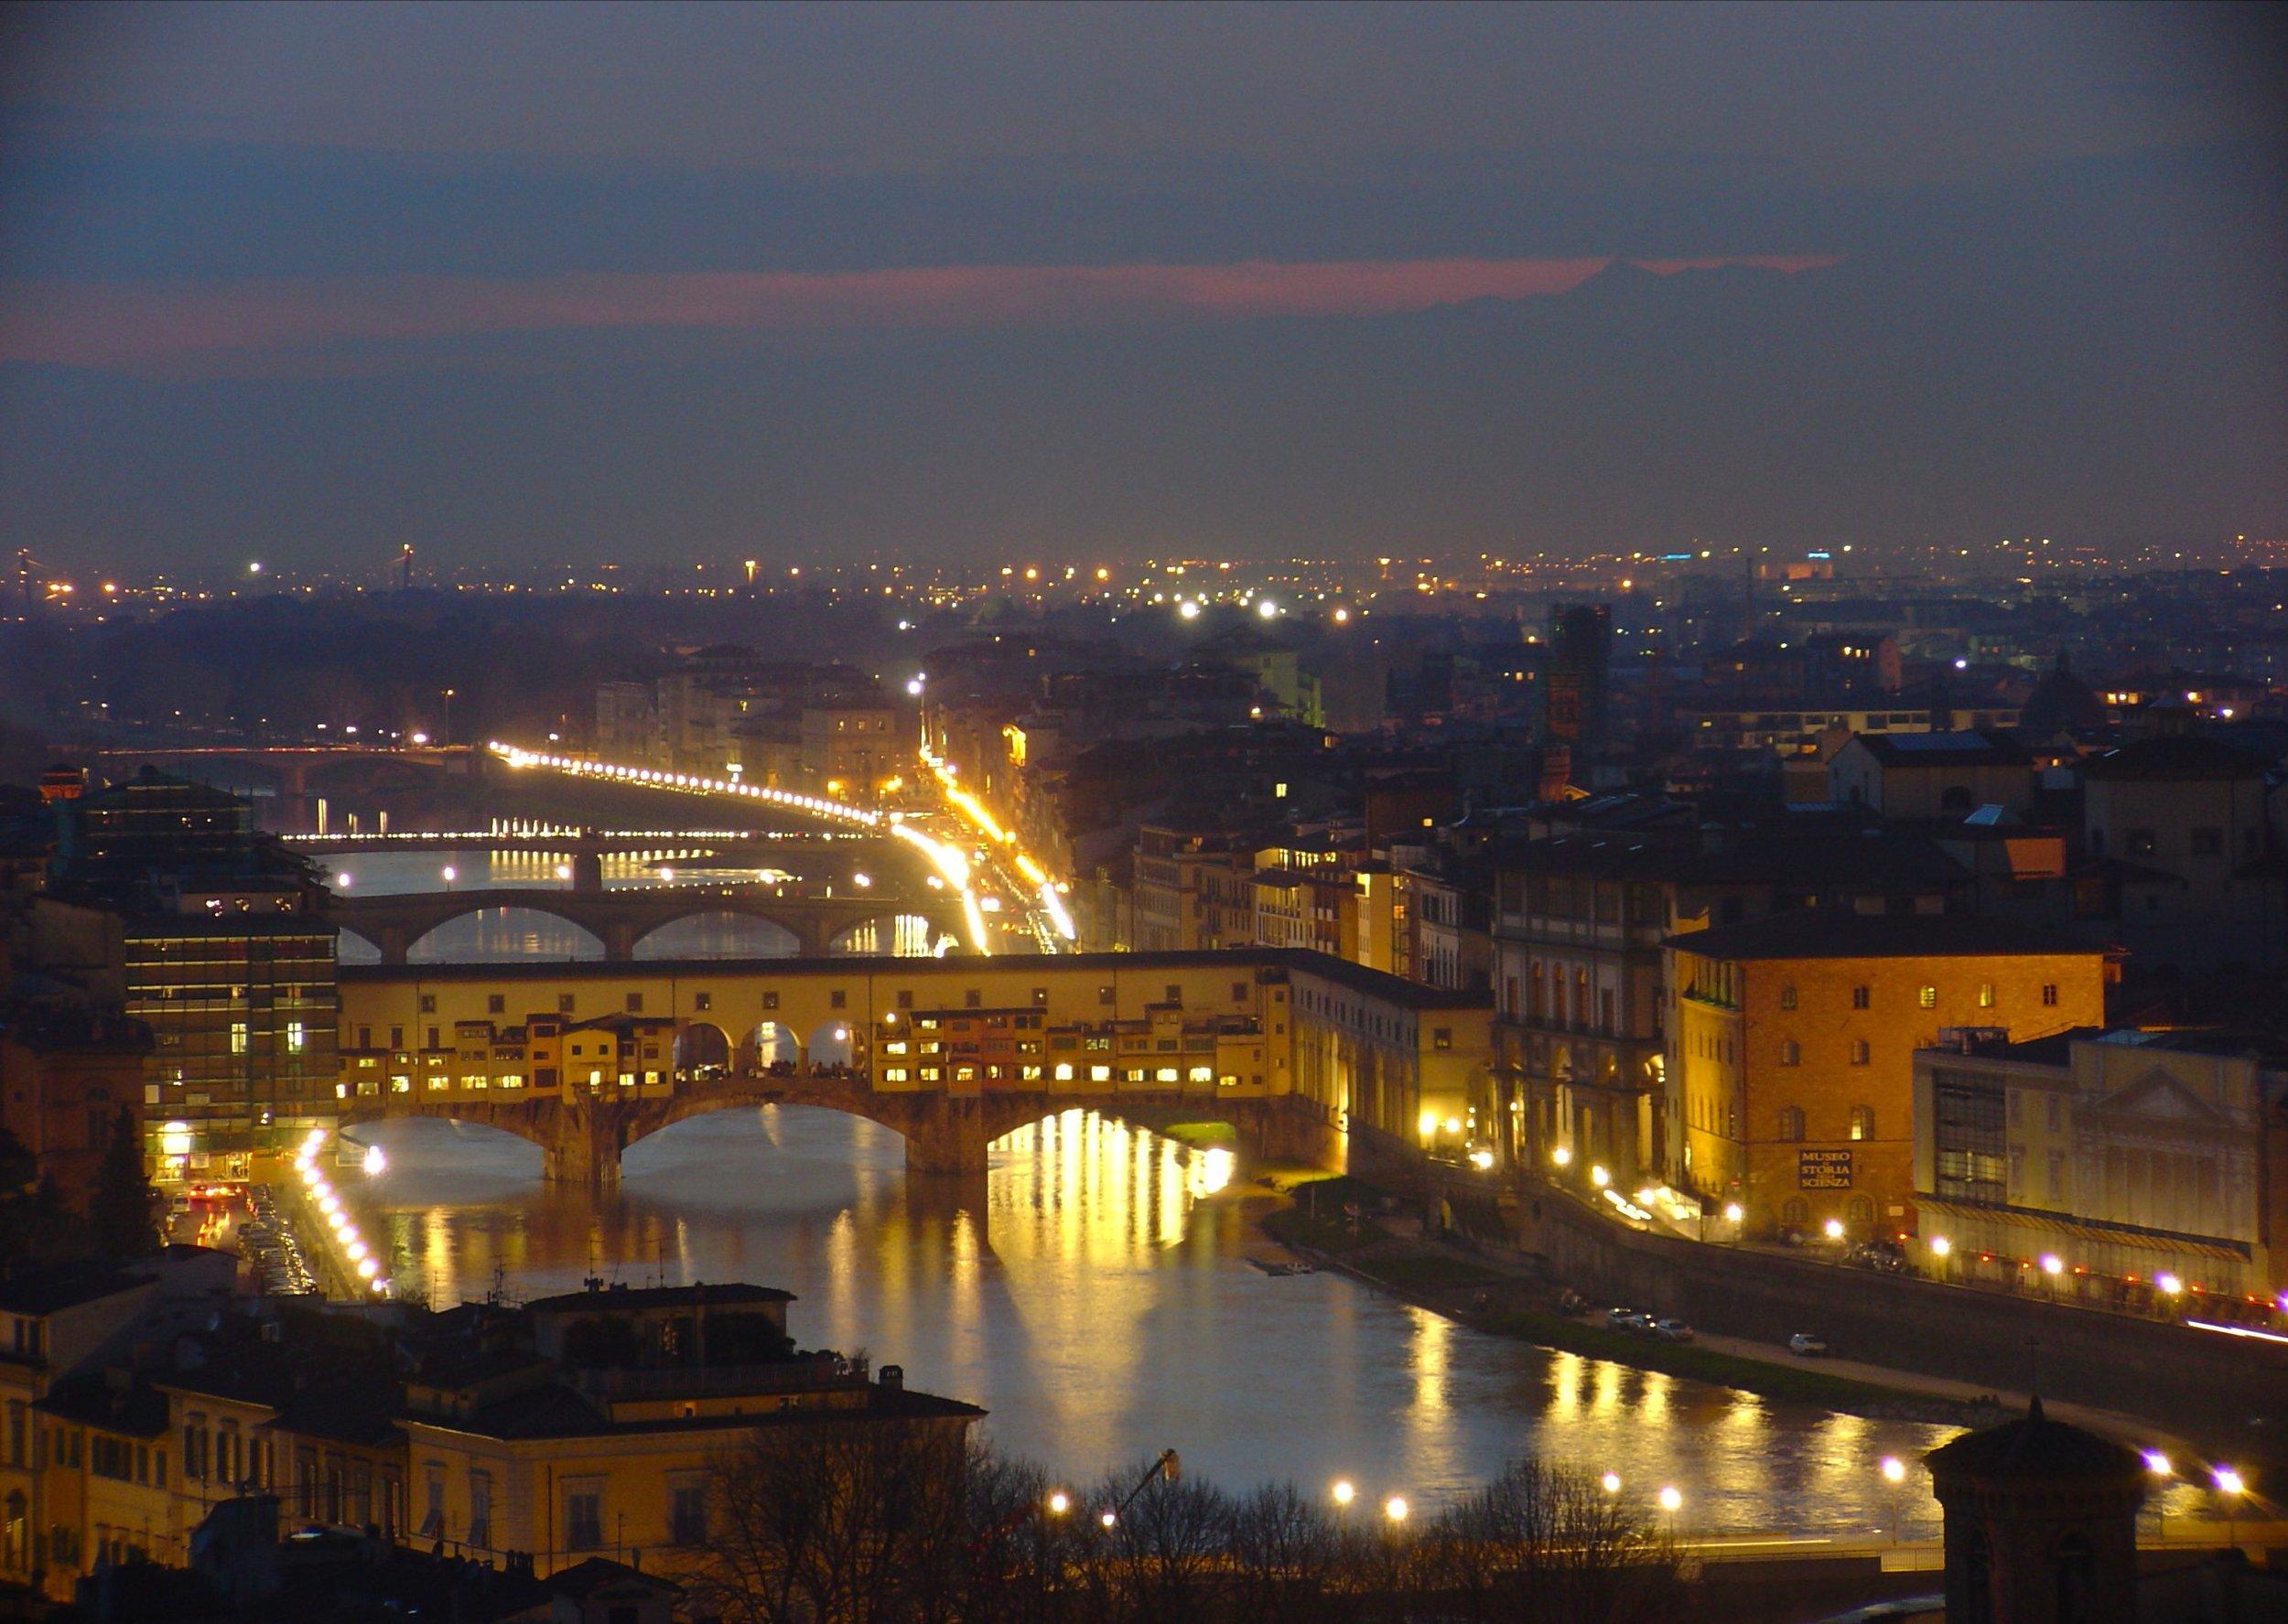 My trip to Italia 069_1.jpg